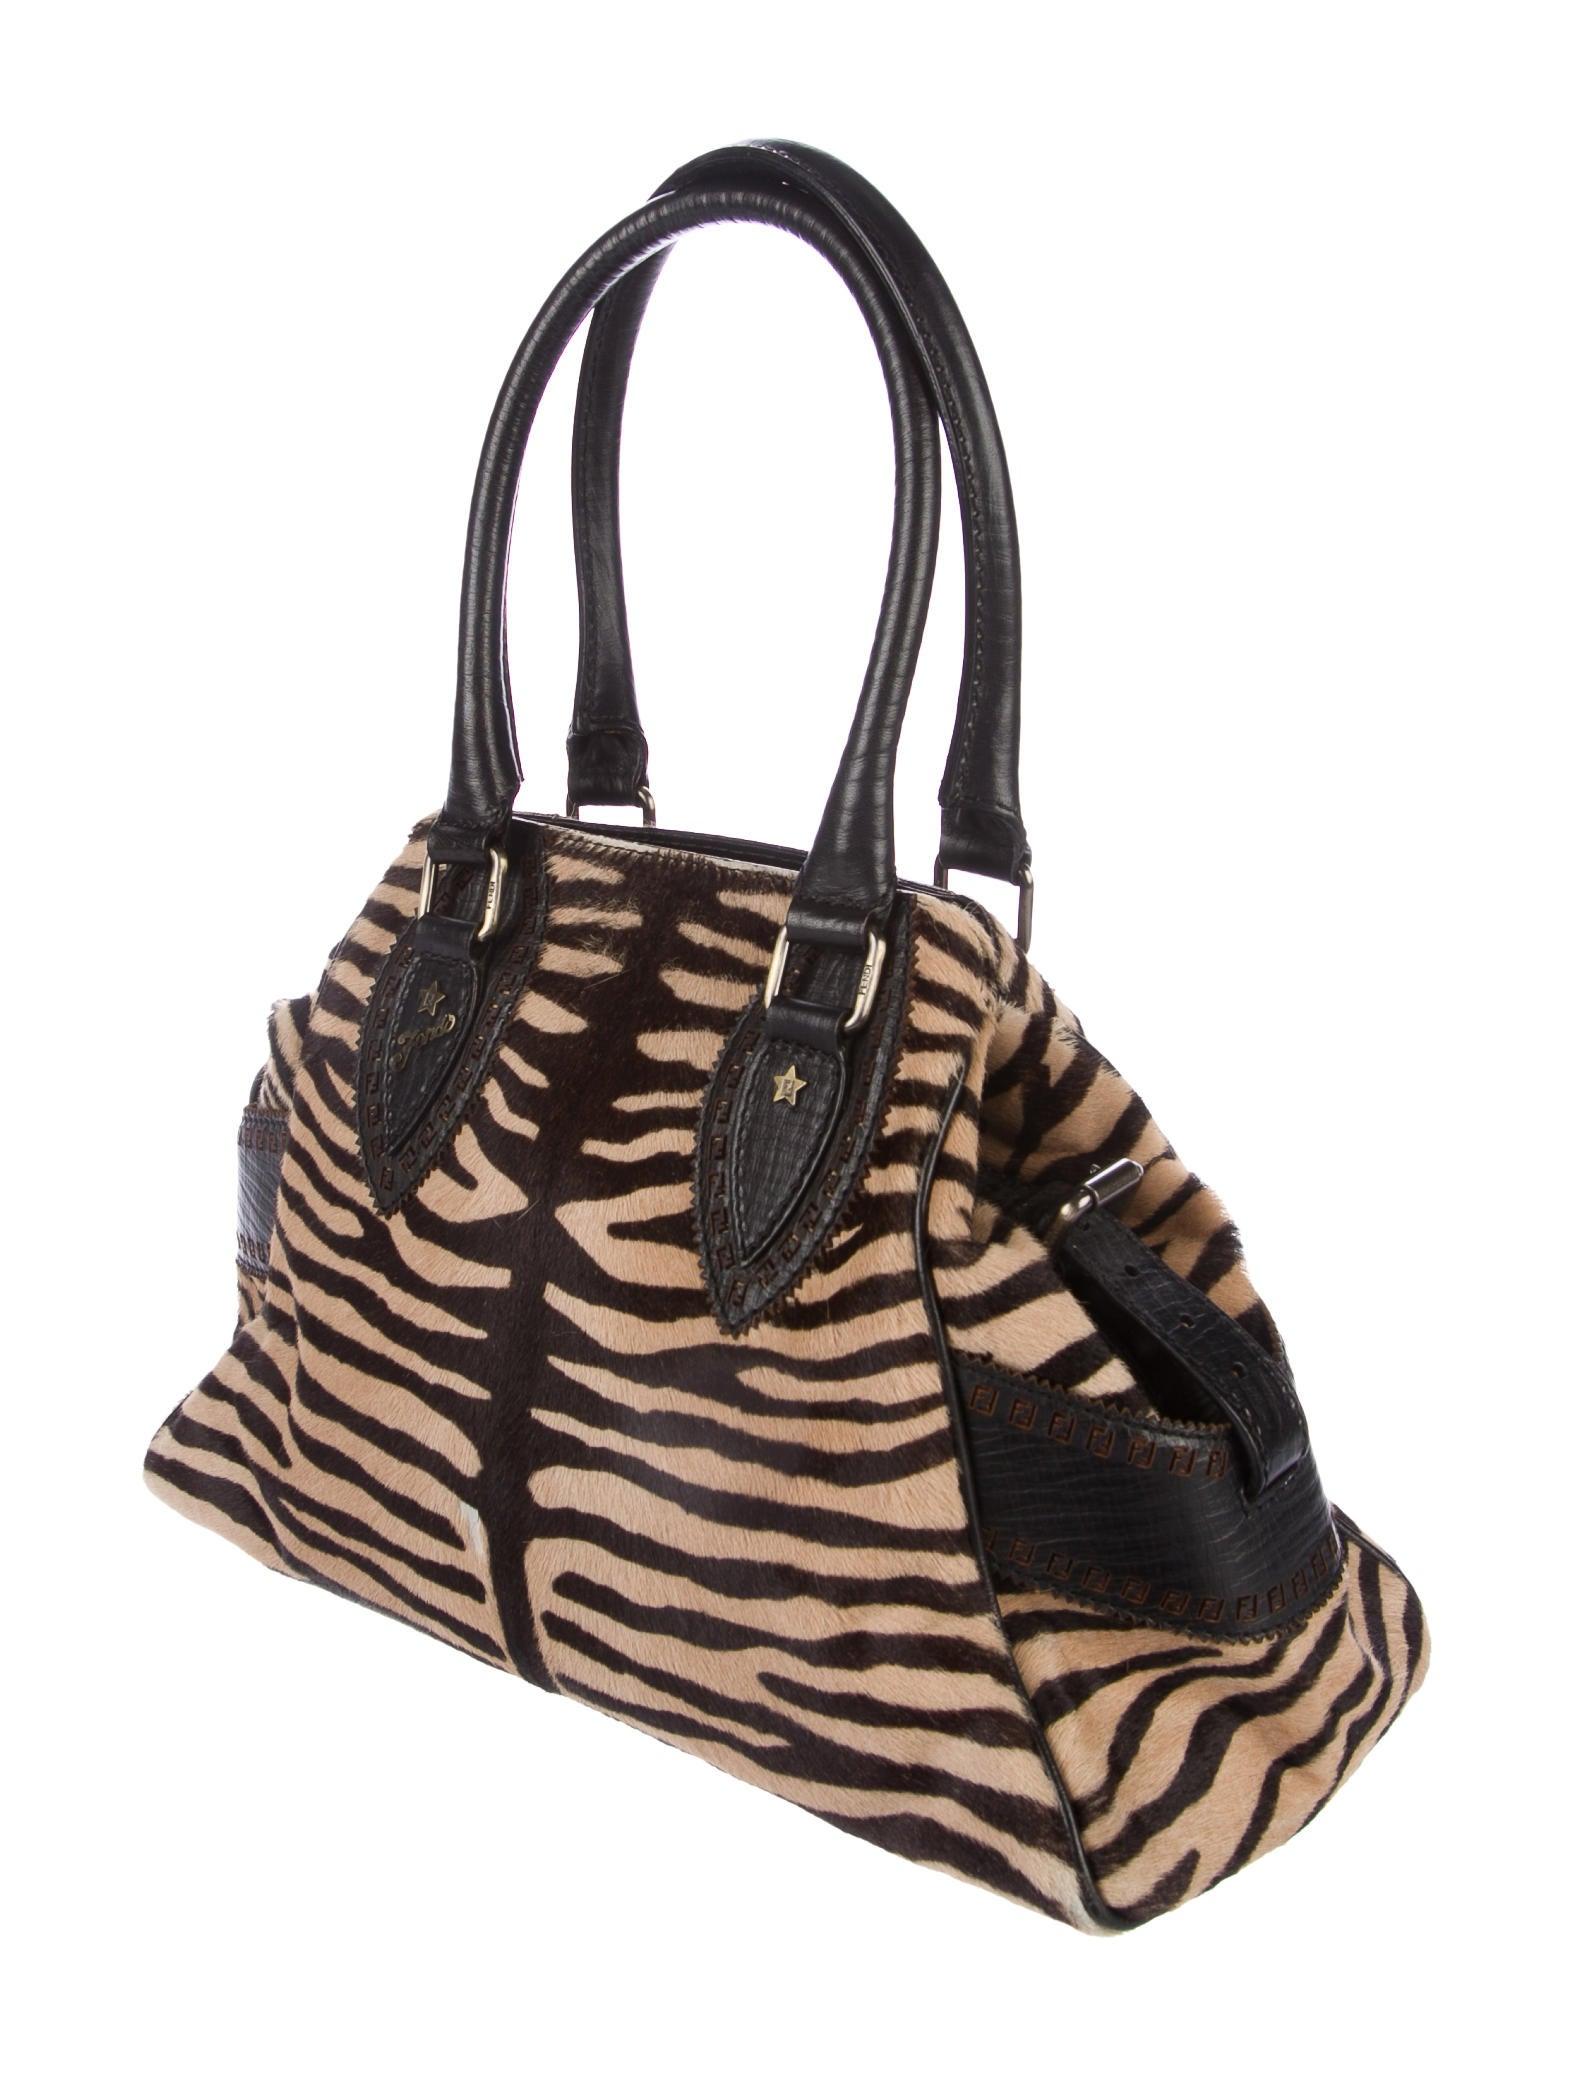 fendi bags usa fendi fur bag fendi by the way small f8b13120046b0